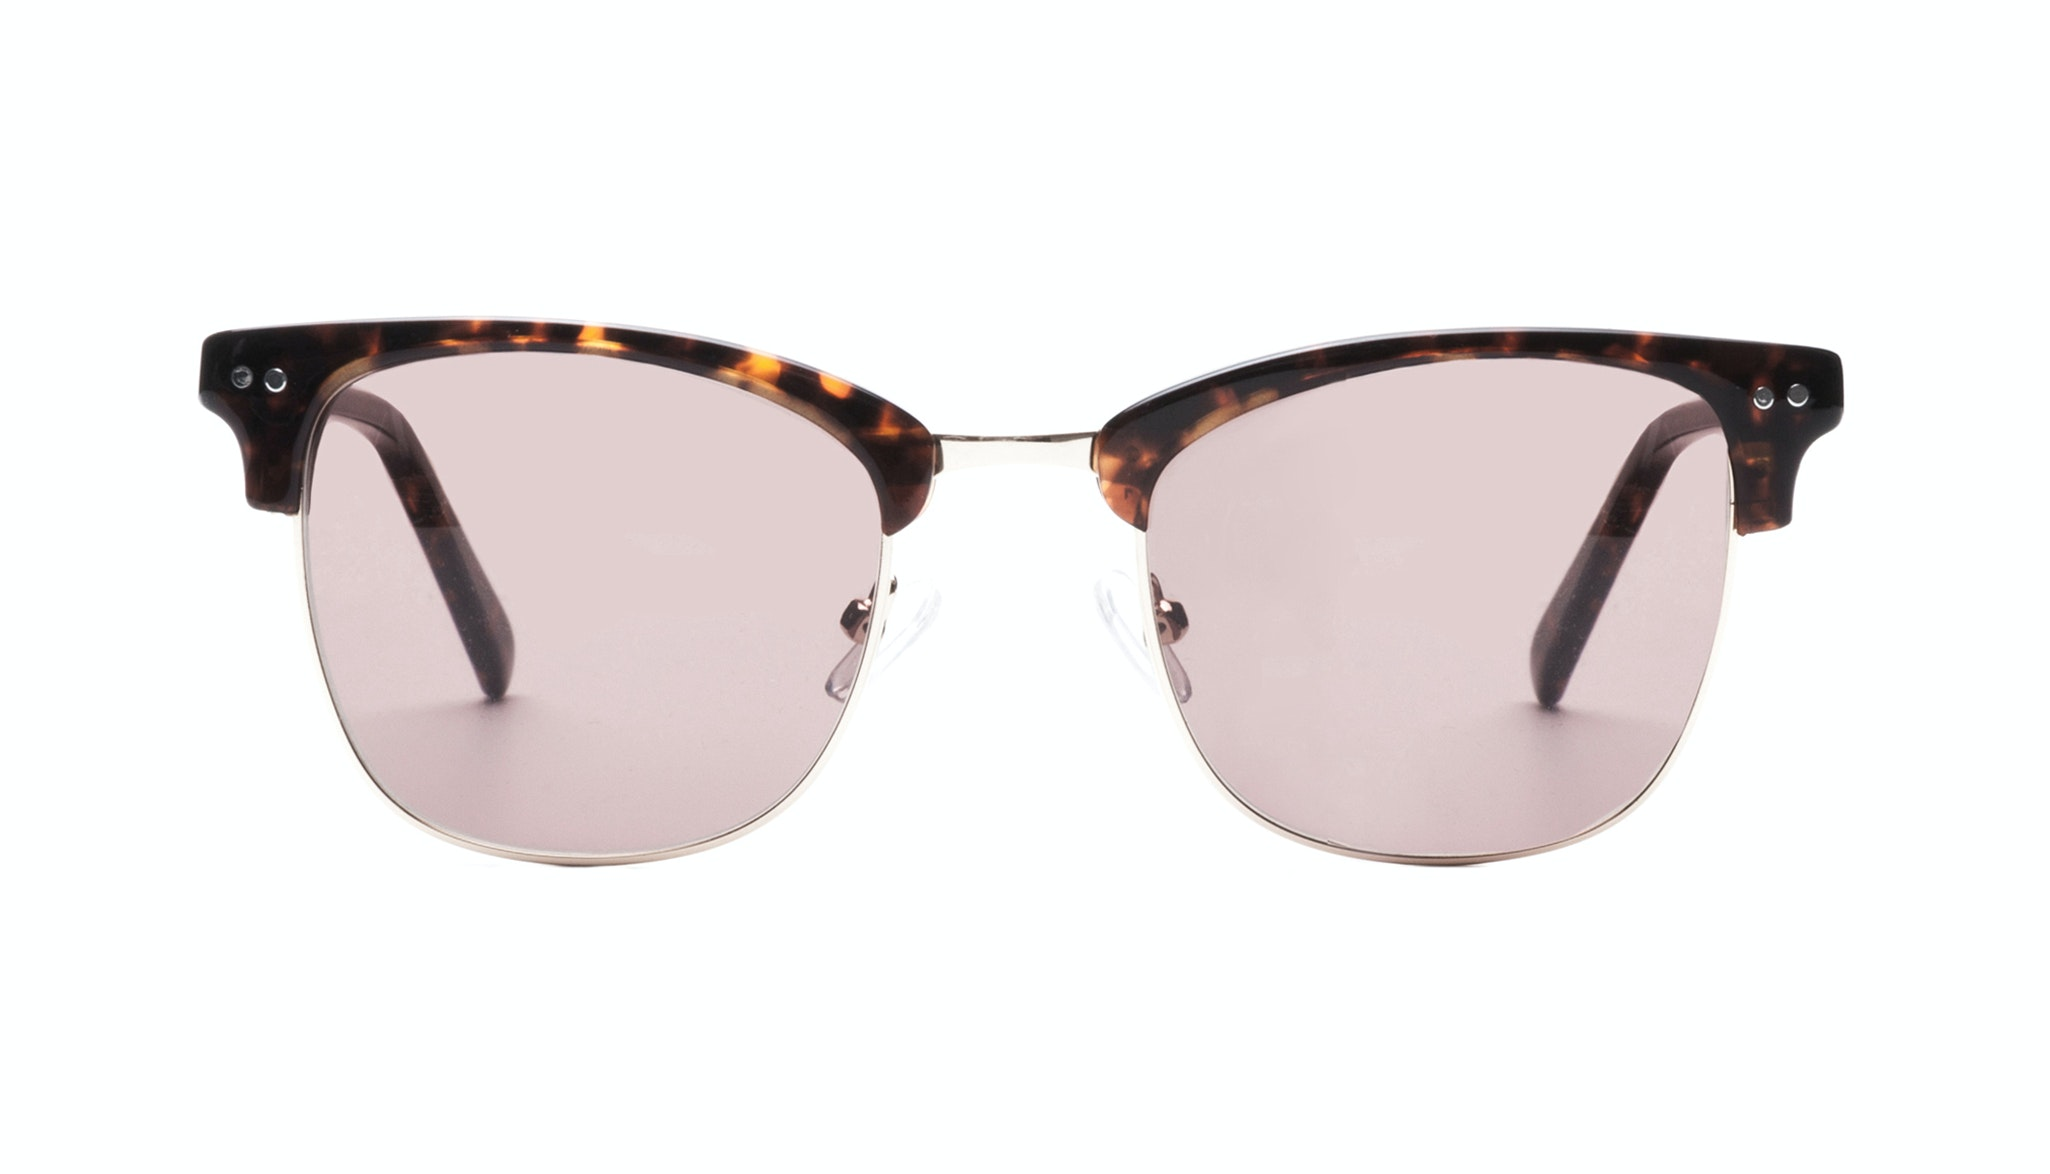 Affordable Fashion Glasses Square Sunglasses Men Lift Gold Sepia